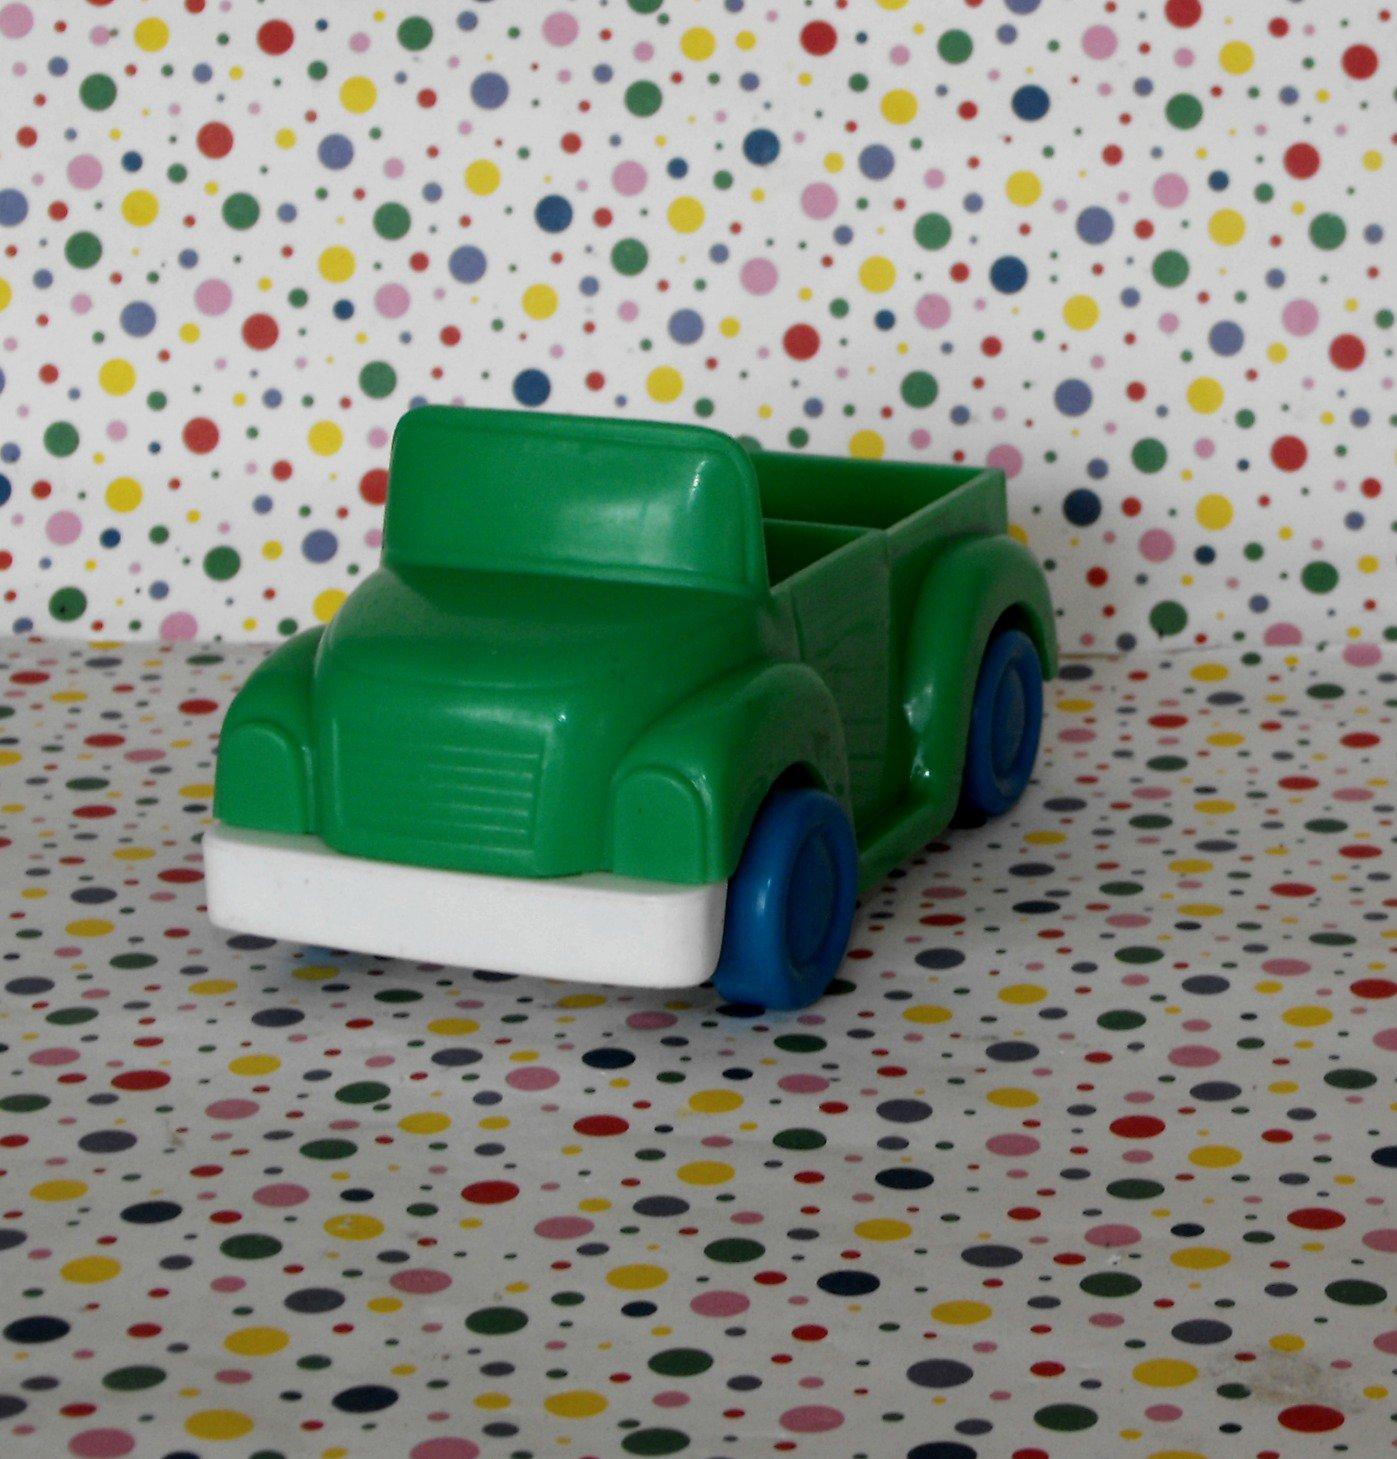 Illco Muppets Sesame Street Car Wash Green Truck Part